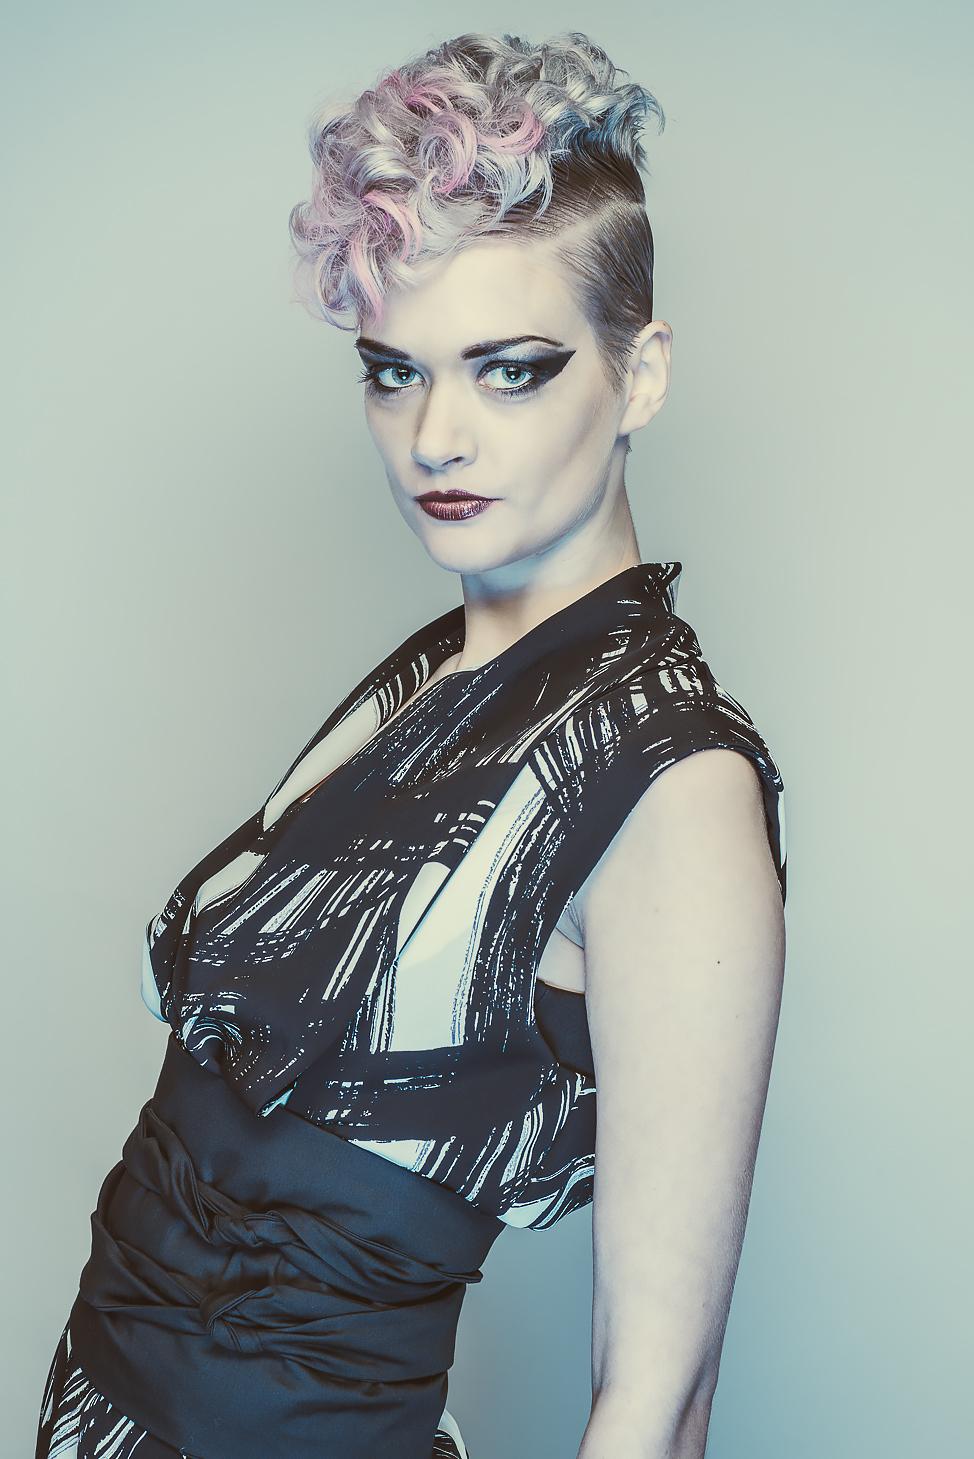 zaramia-ava-zaramiaava-leeds-fashion-designer-ethical-sustainable-tailored-minimalist-emi-print-black-belt-versatile-drape-cowl-styling-womenswear-models-photoshoot-shrine-hairdressers-69